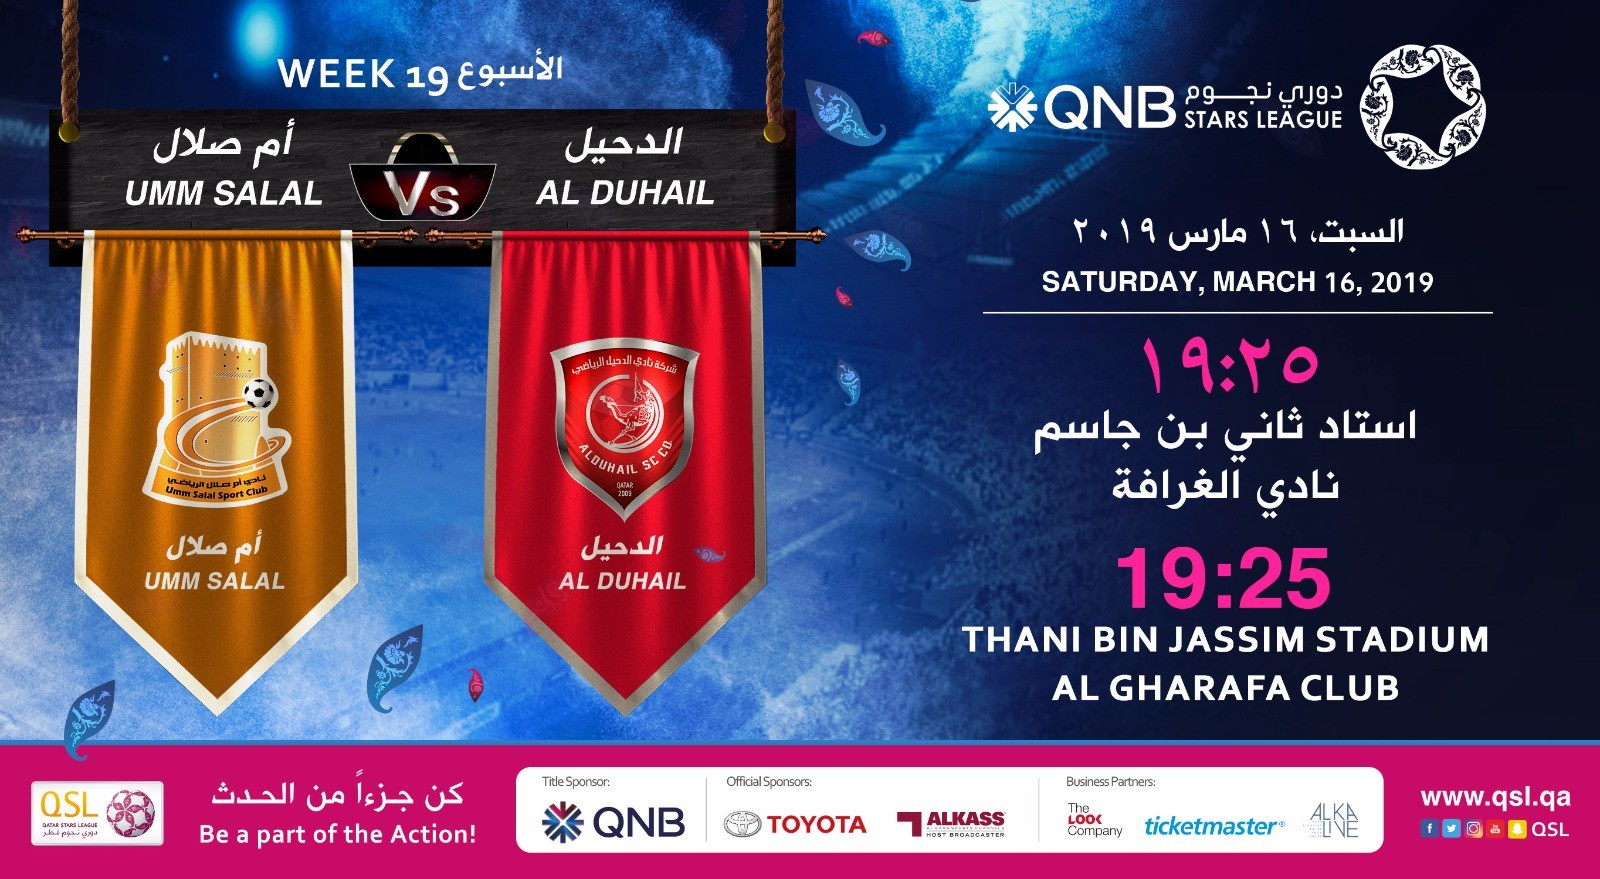 QNB Stars League Week 19 — Umm Salal vs Al Duhail